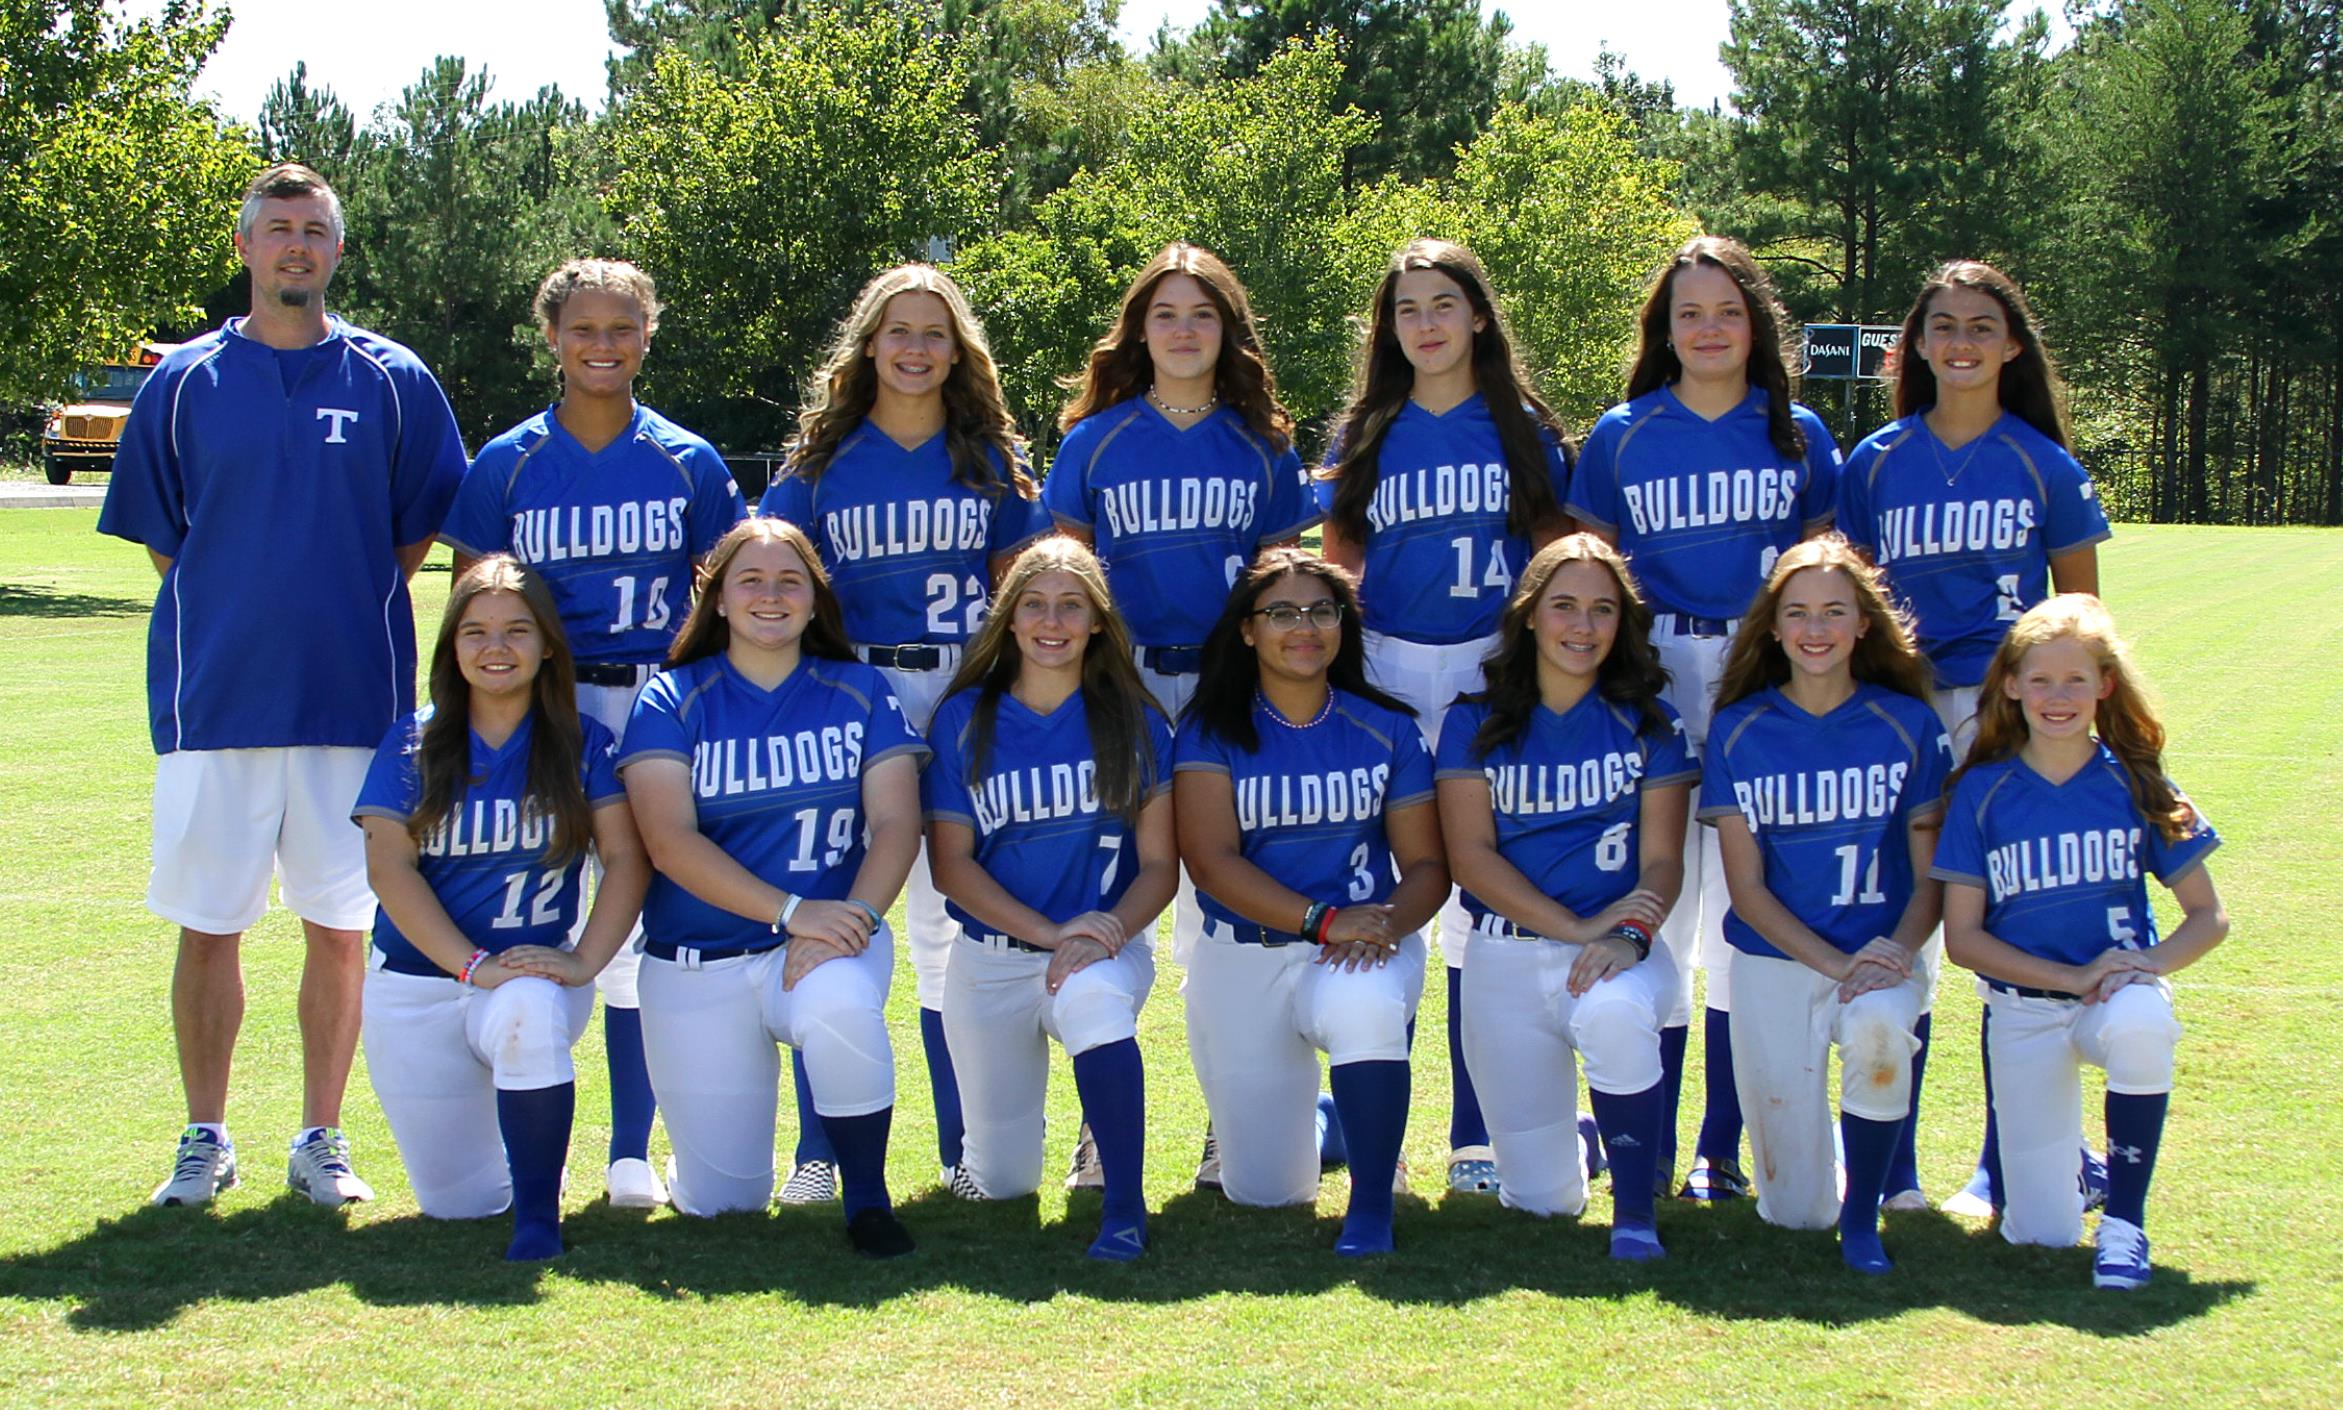 Trion Middle School Softball Team